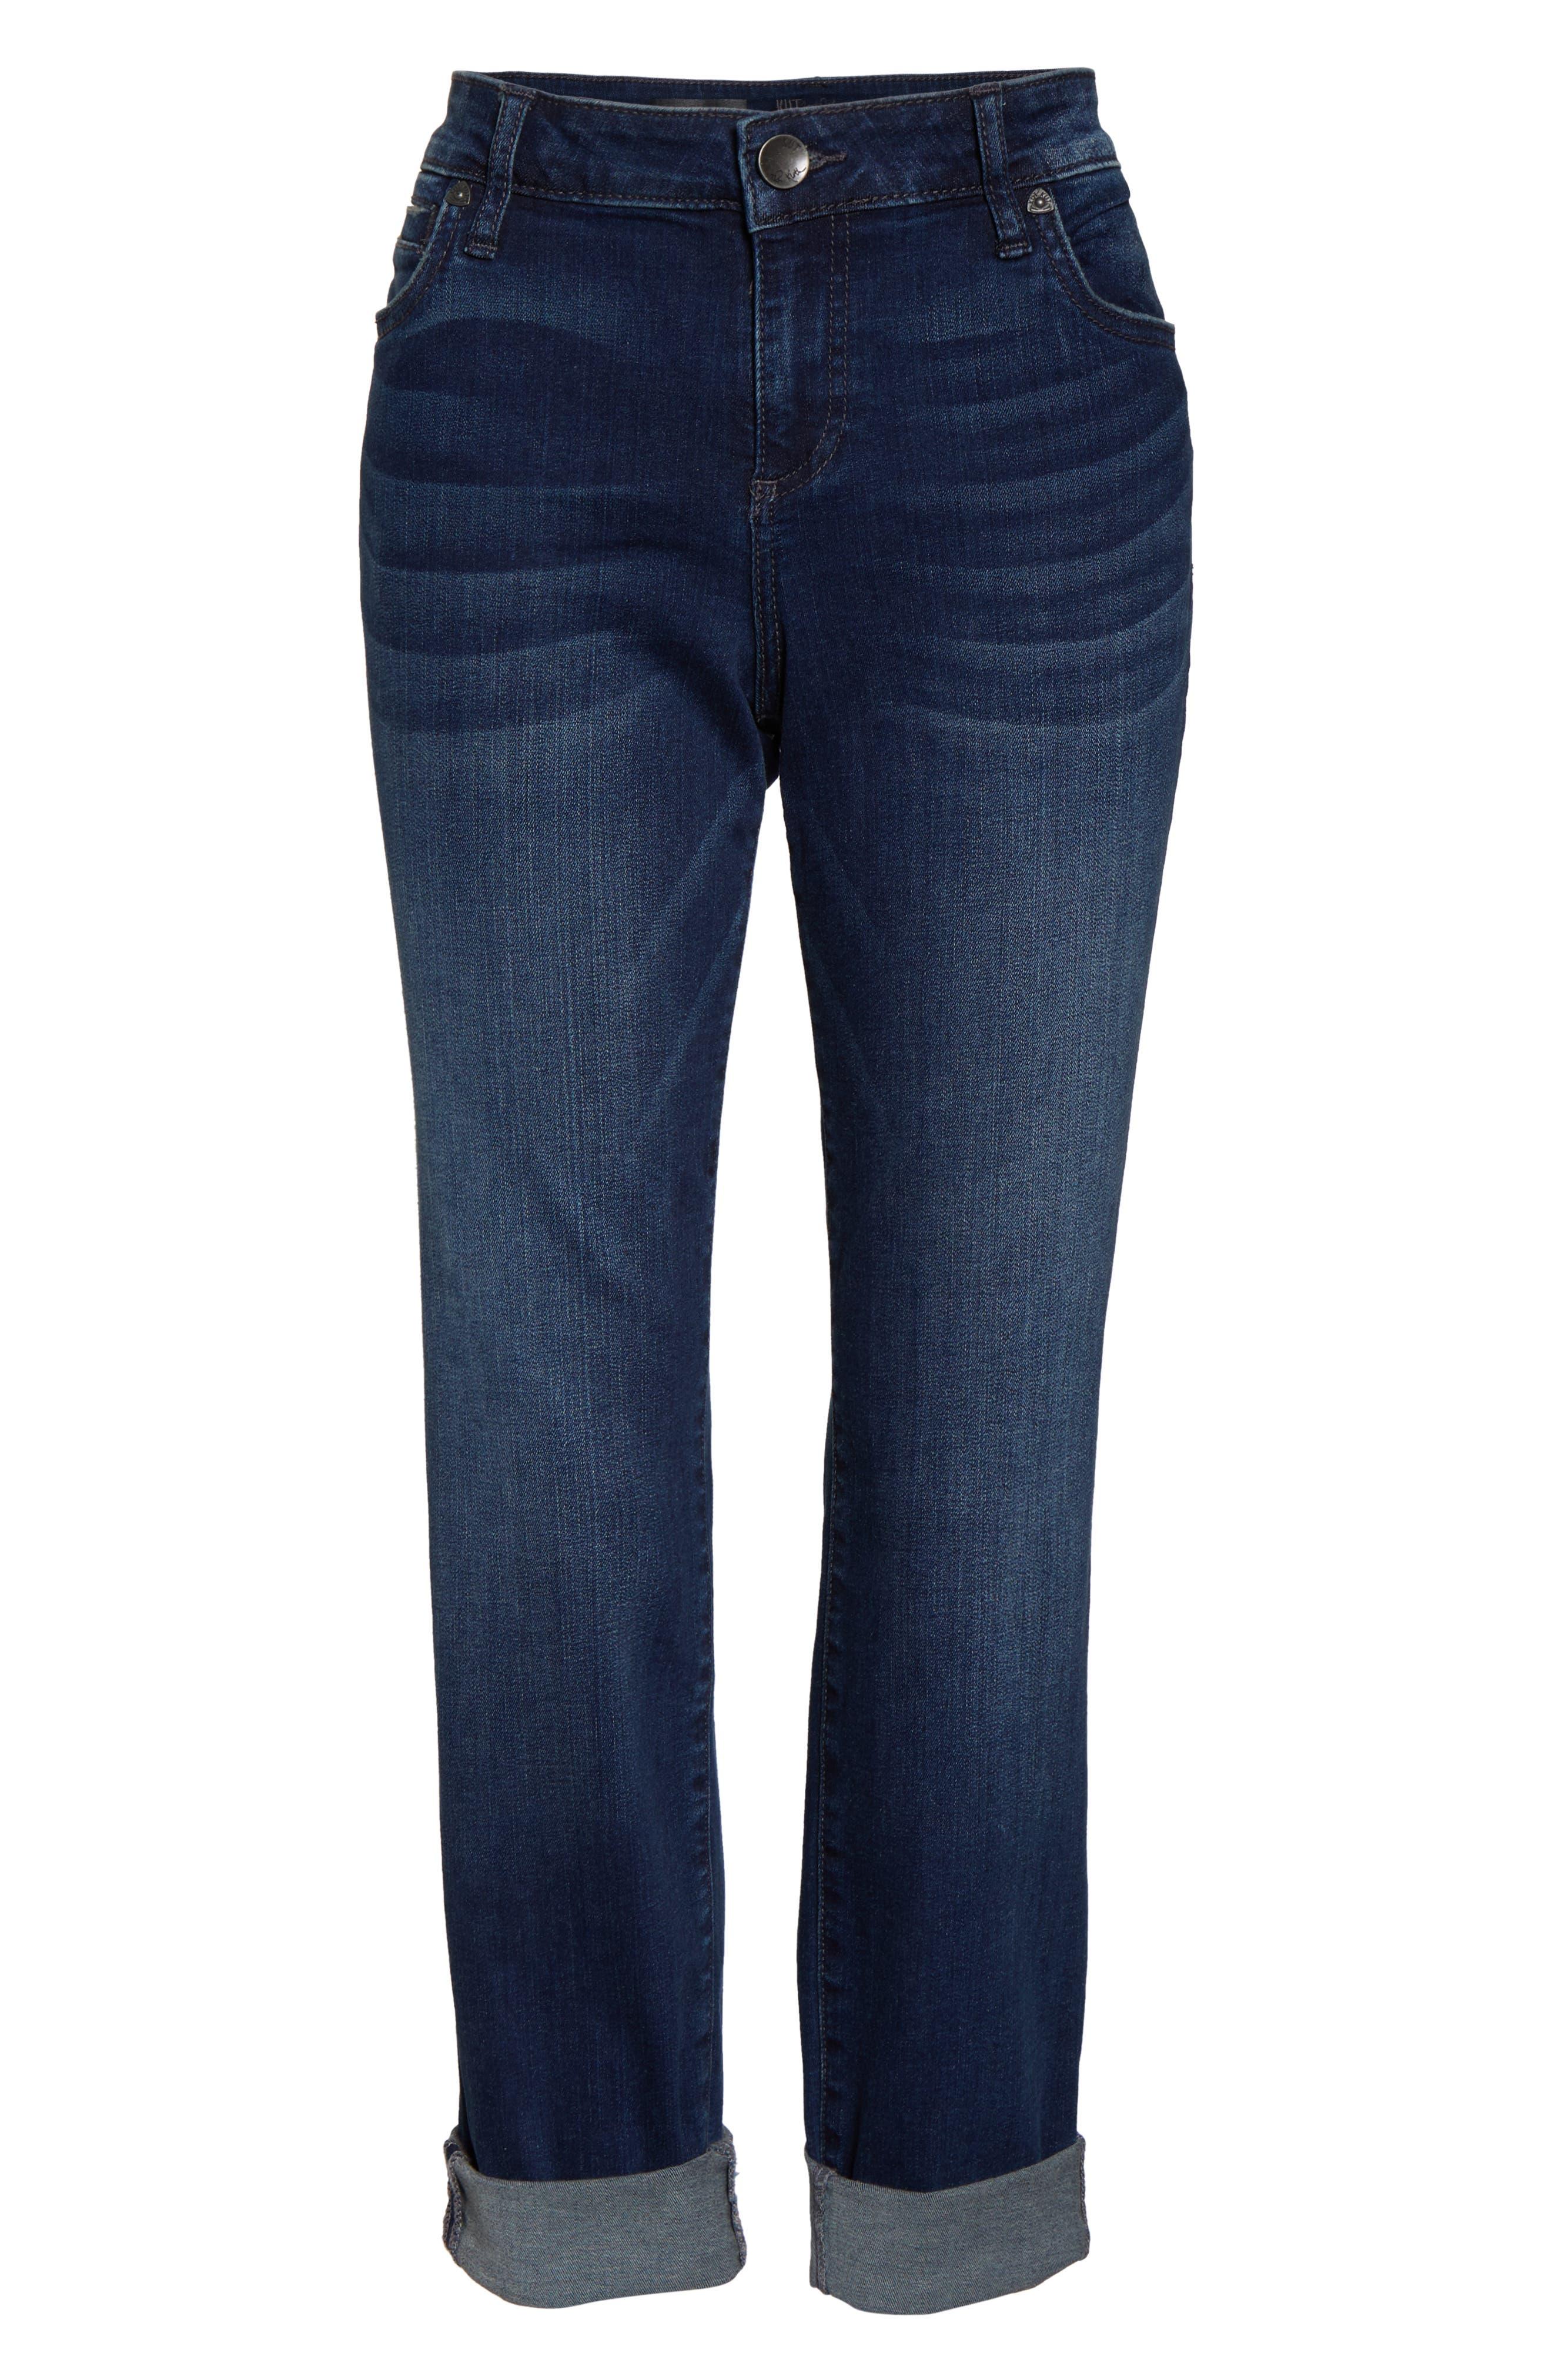 KUT FROM THE KLOTH, 'Catherine' Slim Boyfriend Jeans, Alternate thumbnail 6, color, CAREFULNESS